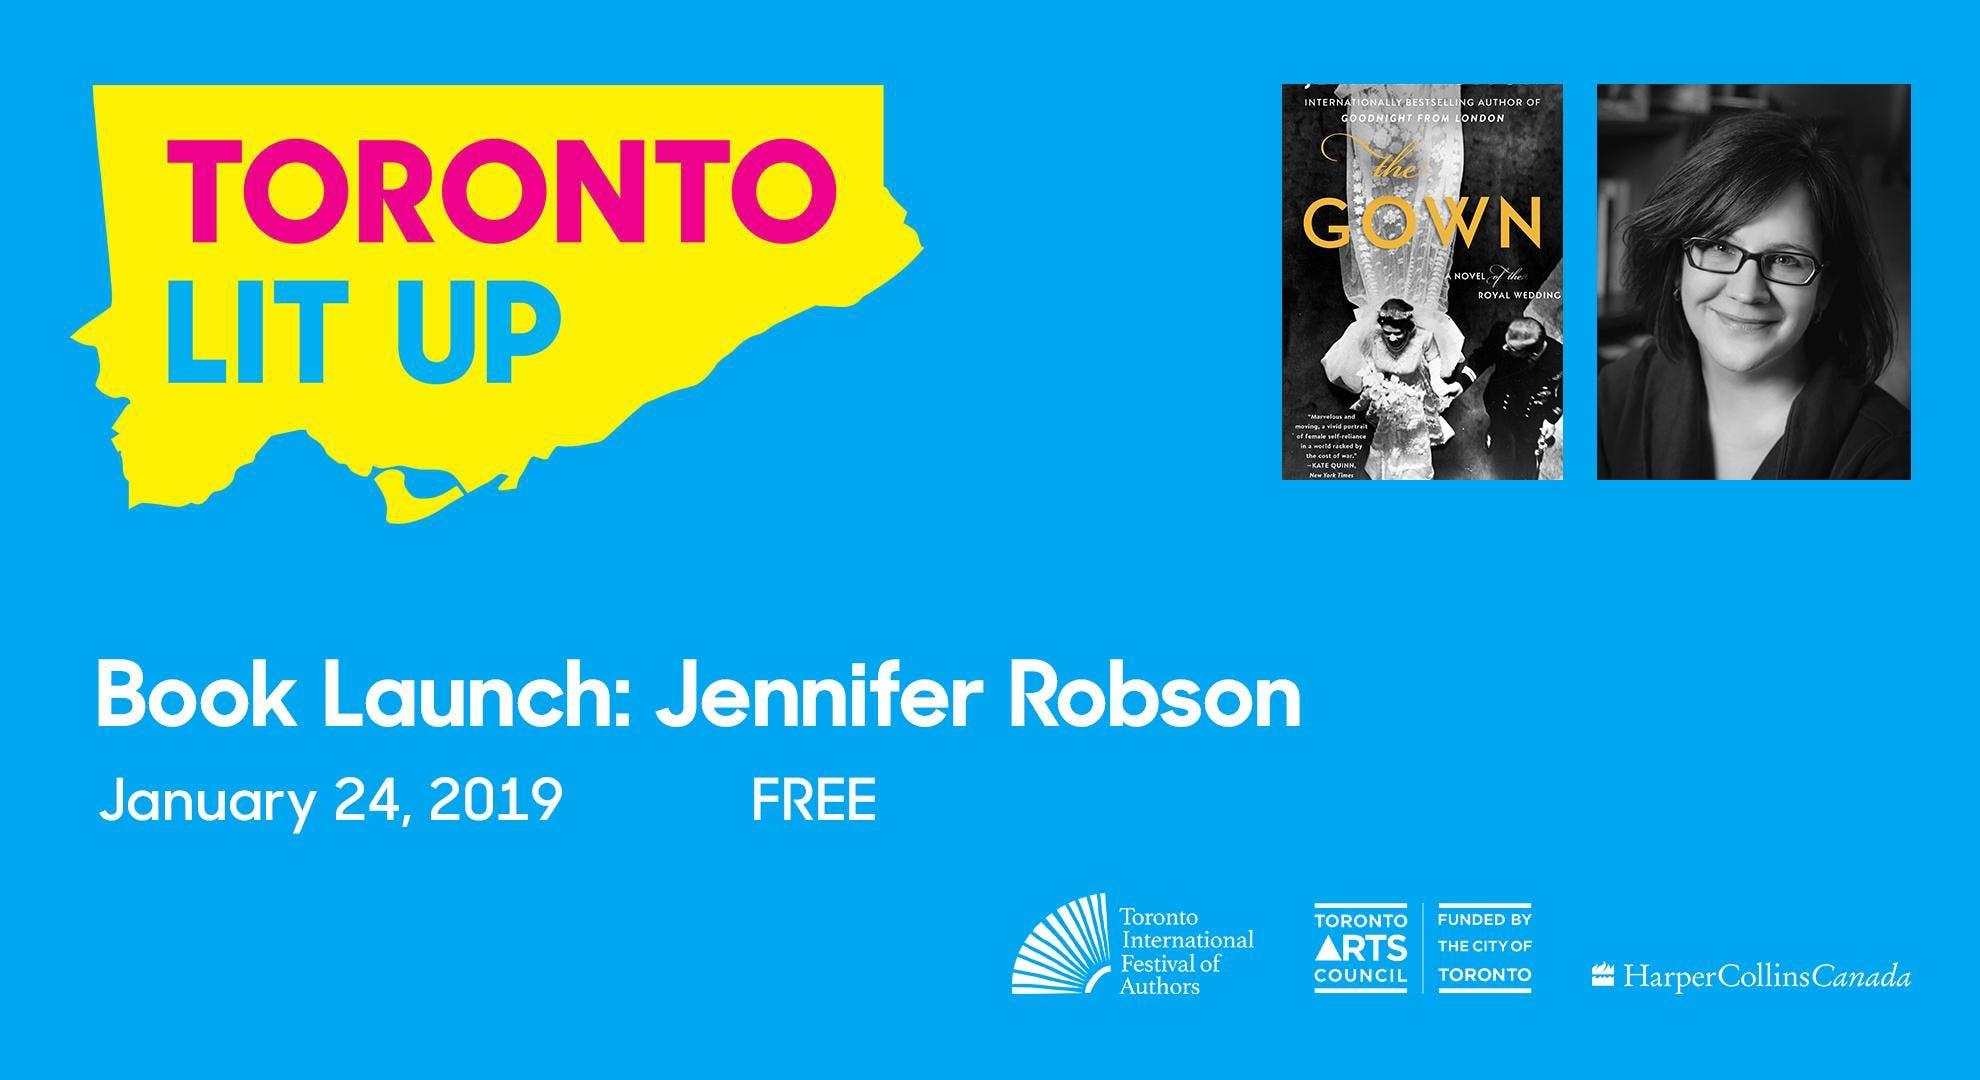 Toronto Lit Up: Jennifer Robson